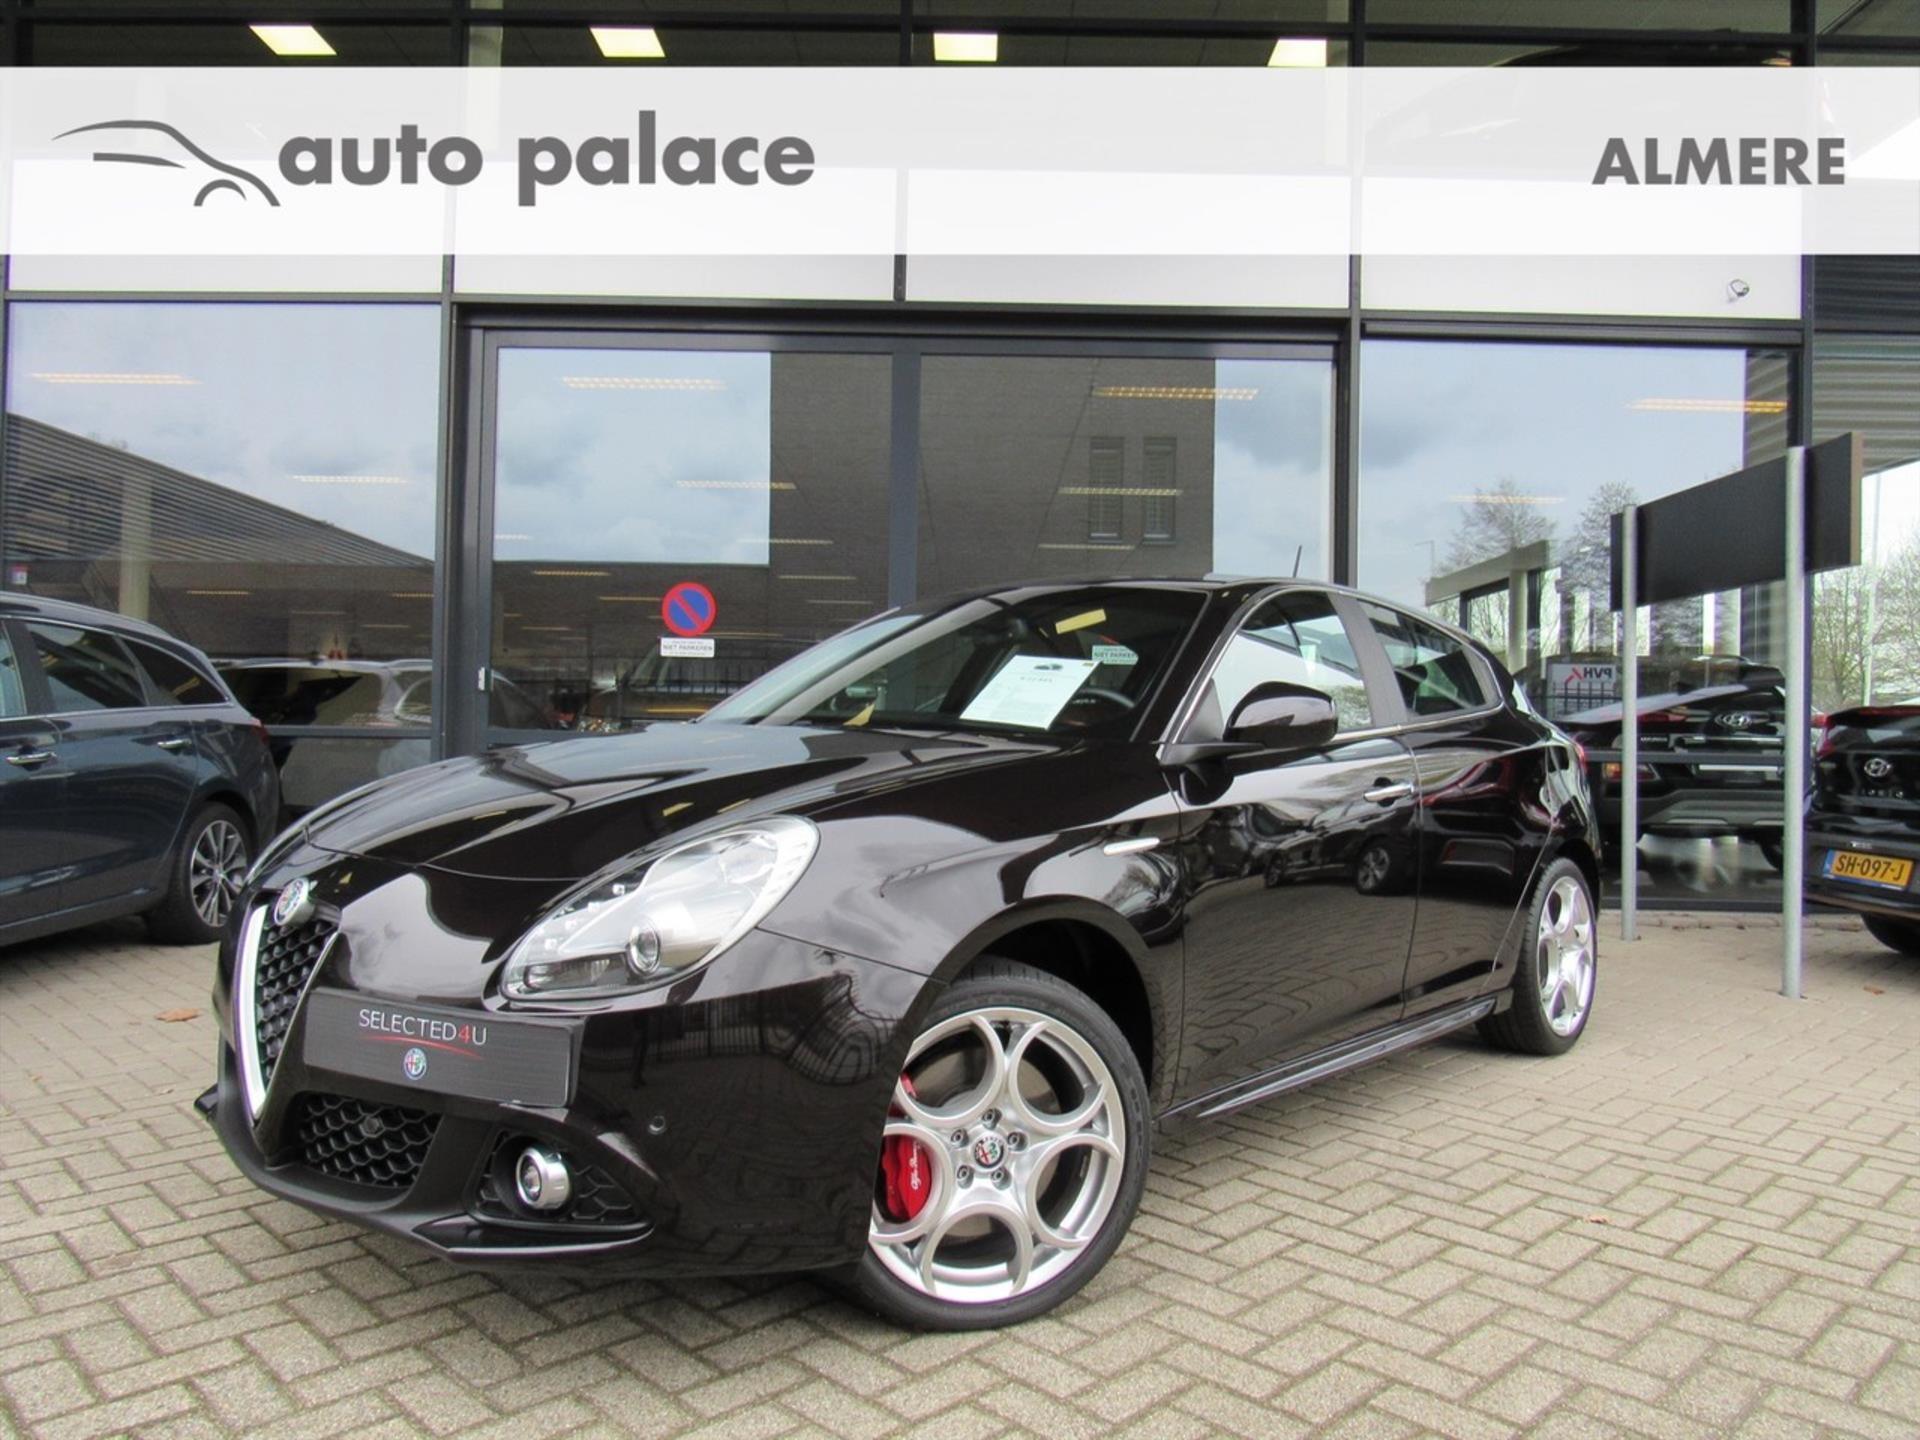 Alfa romeo Giulietta 1.4 turbo 170pk tct super